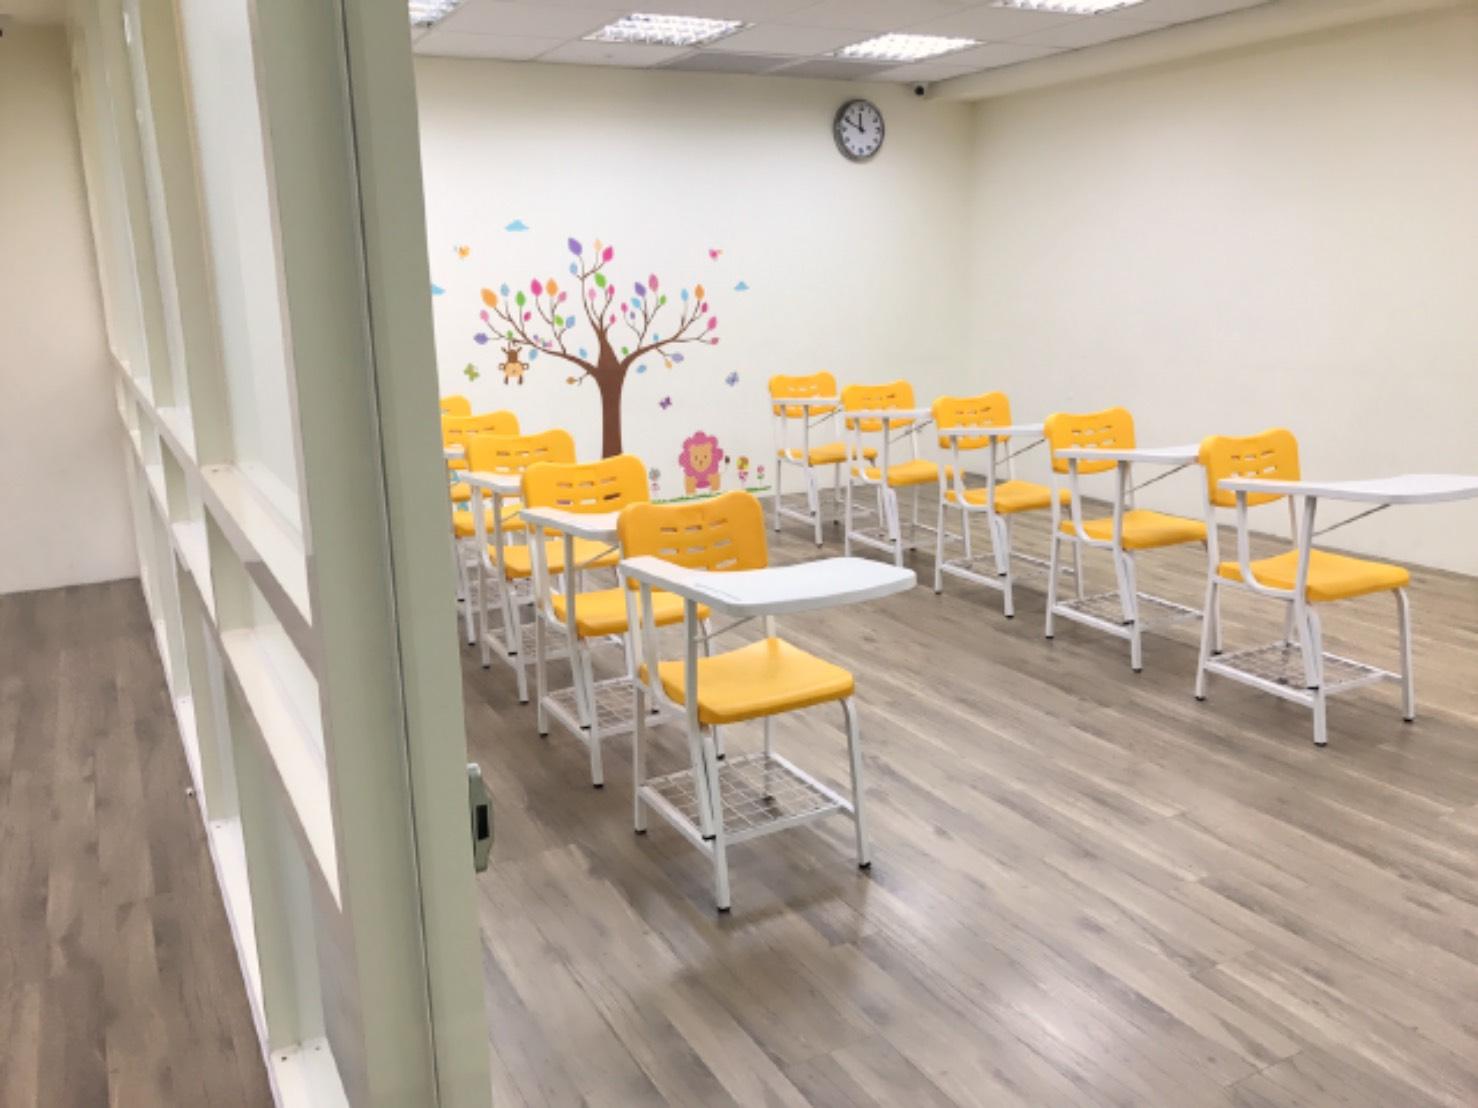 Teaching English and Living in Taiwan Jobs Available 教學工作, SHANE ENGLISH SCHOOL Native English teacher wanted - SHANE ENGLISH Hsinchu  image